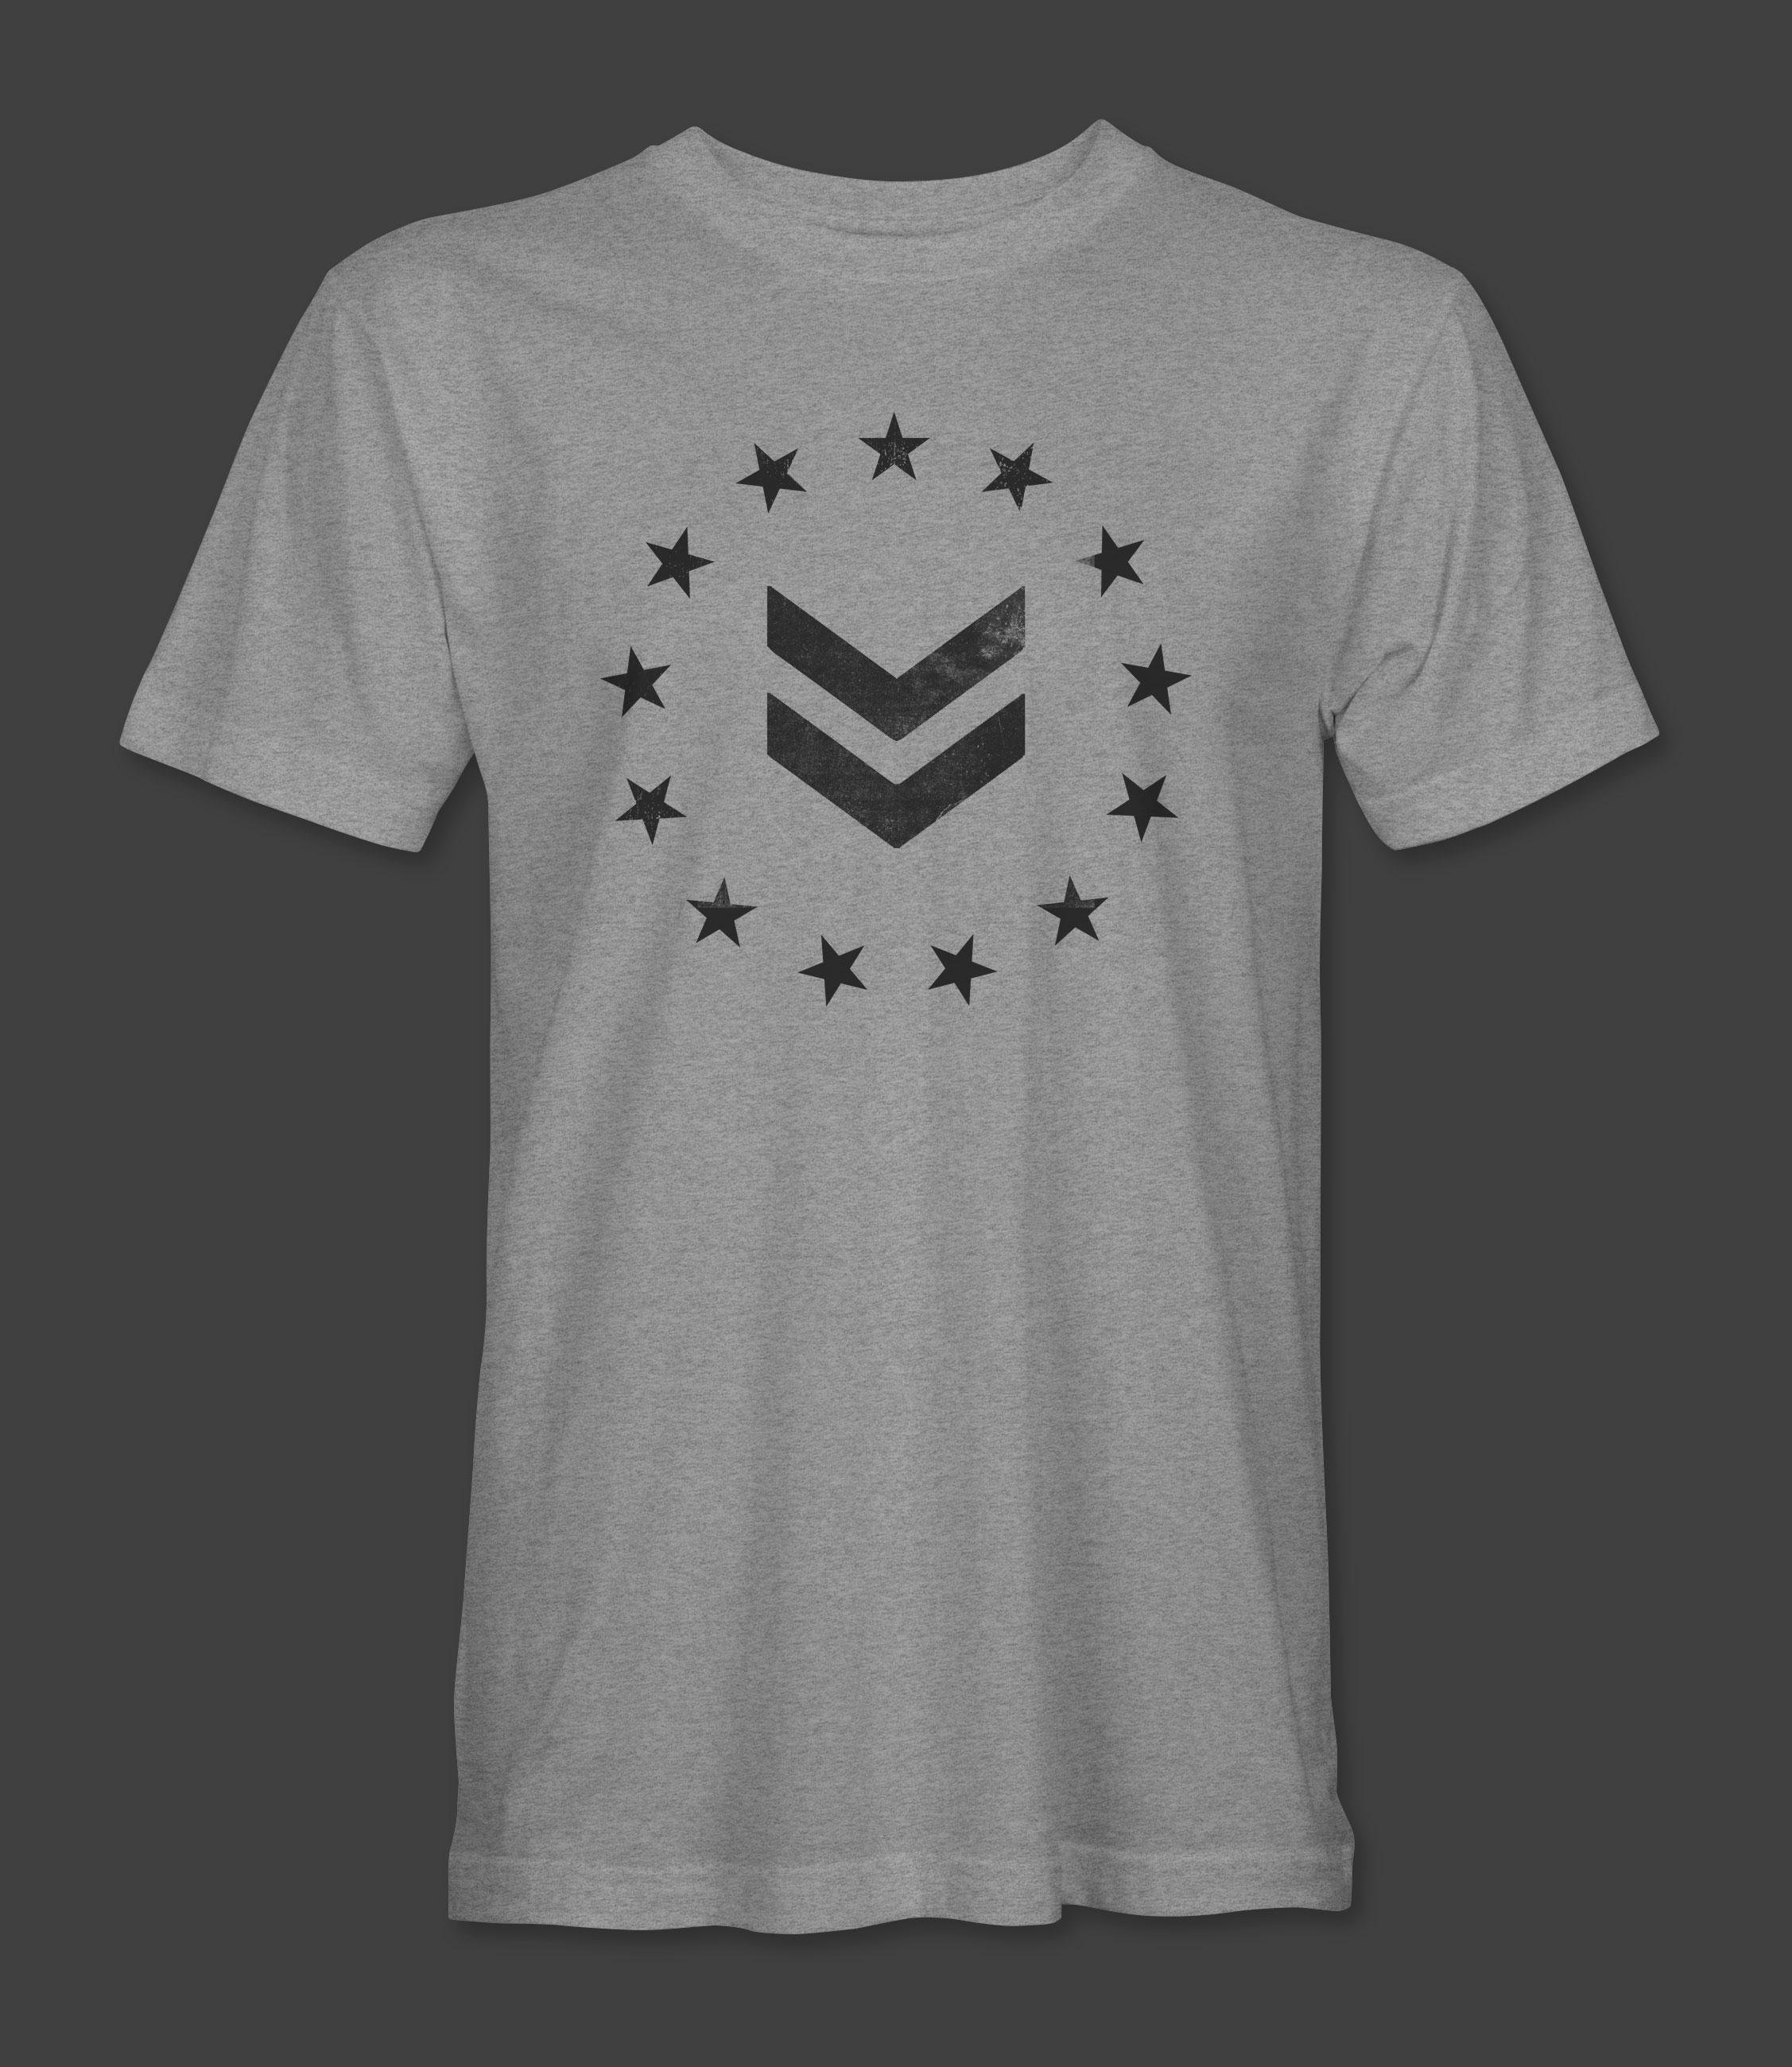 13 Stars T-Shirt - Grey